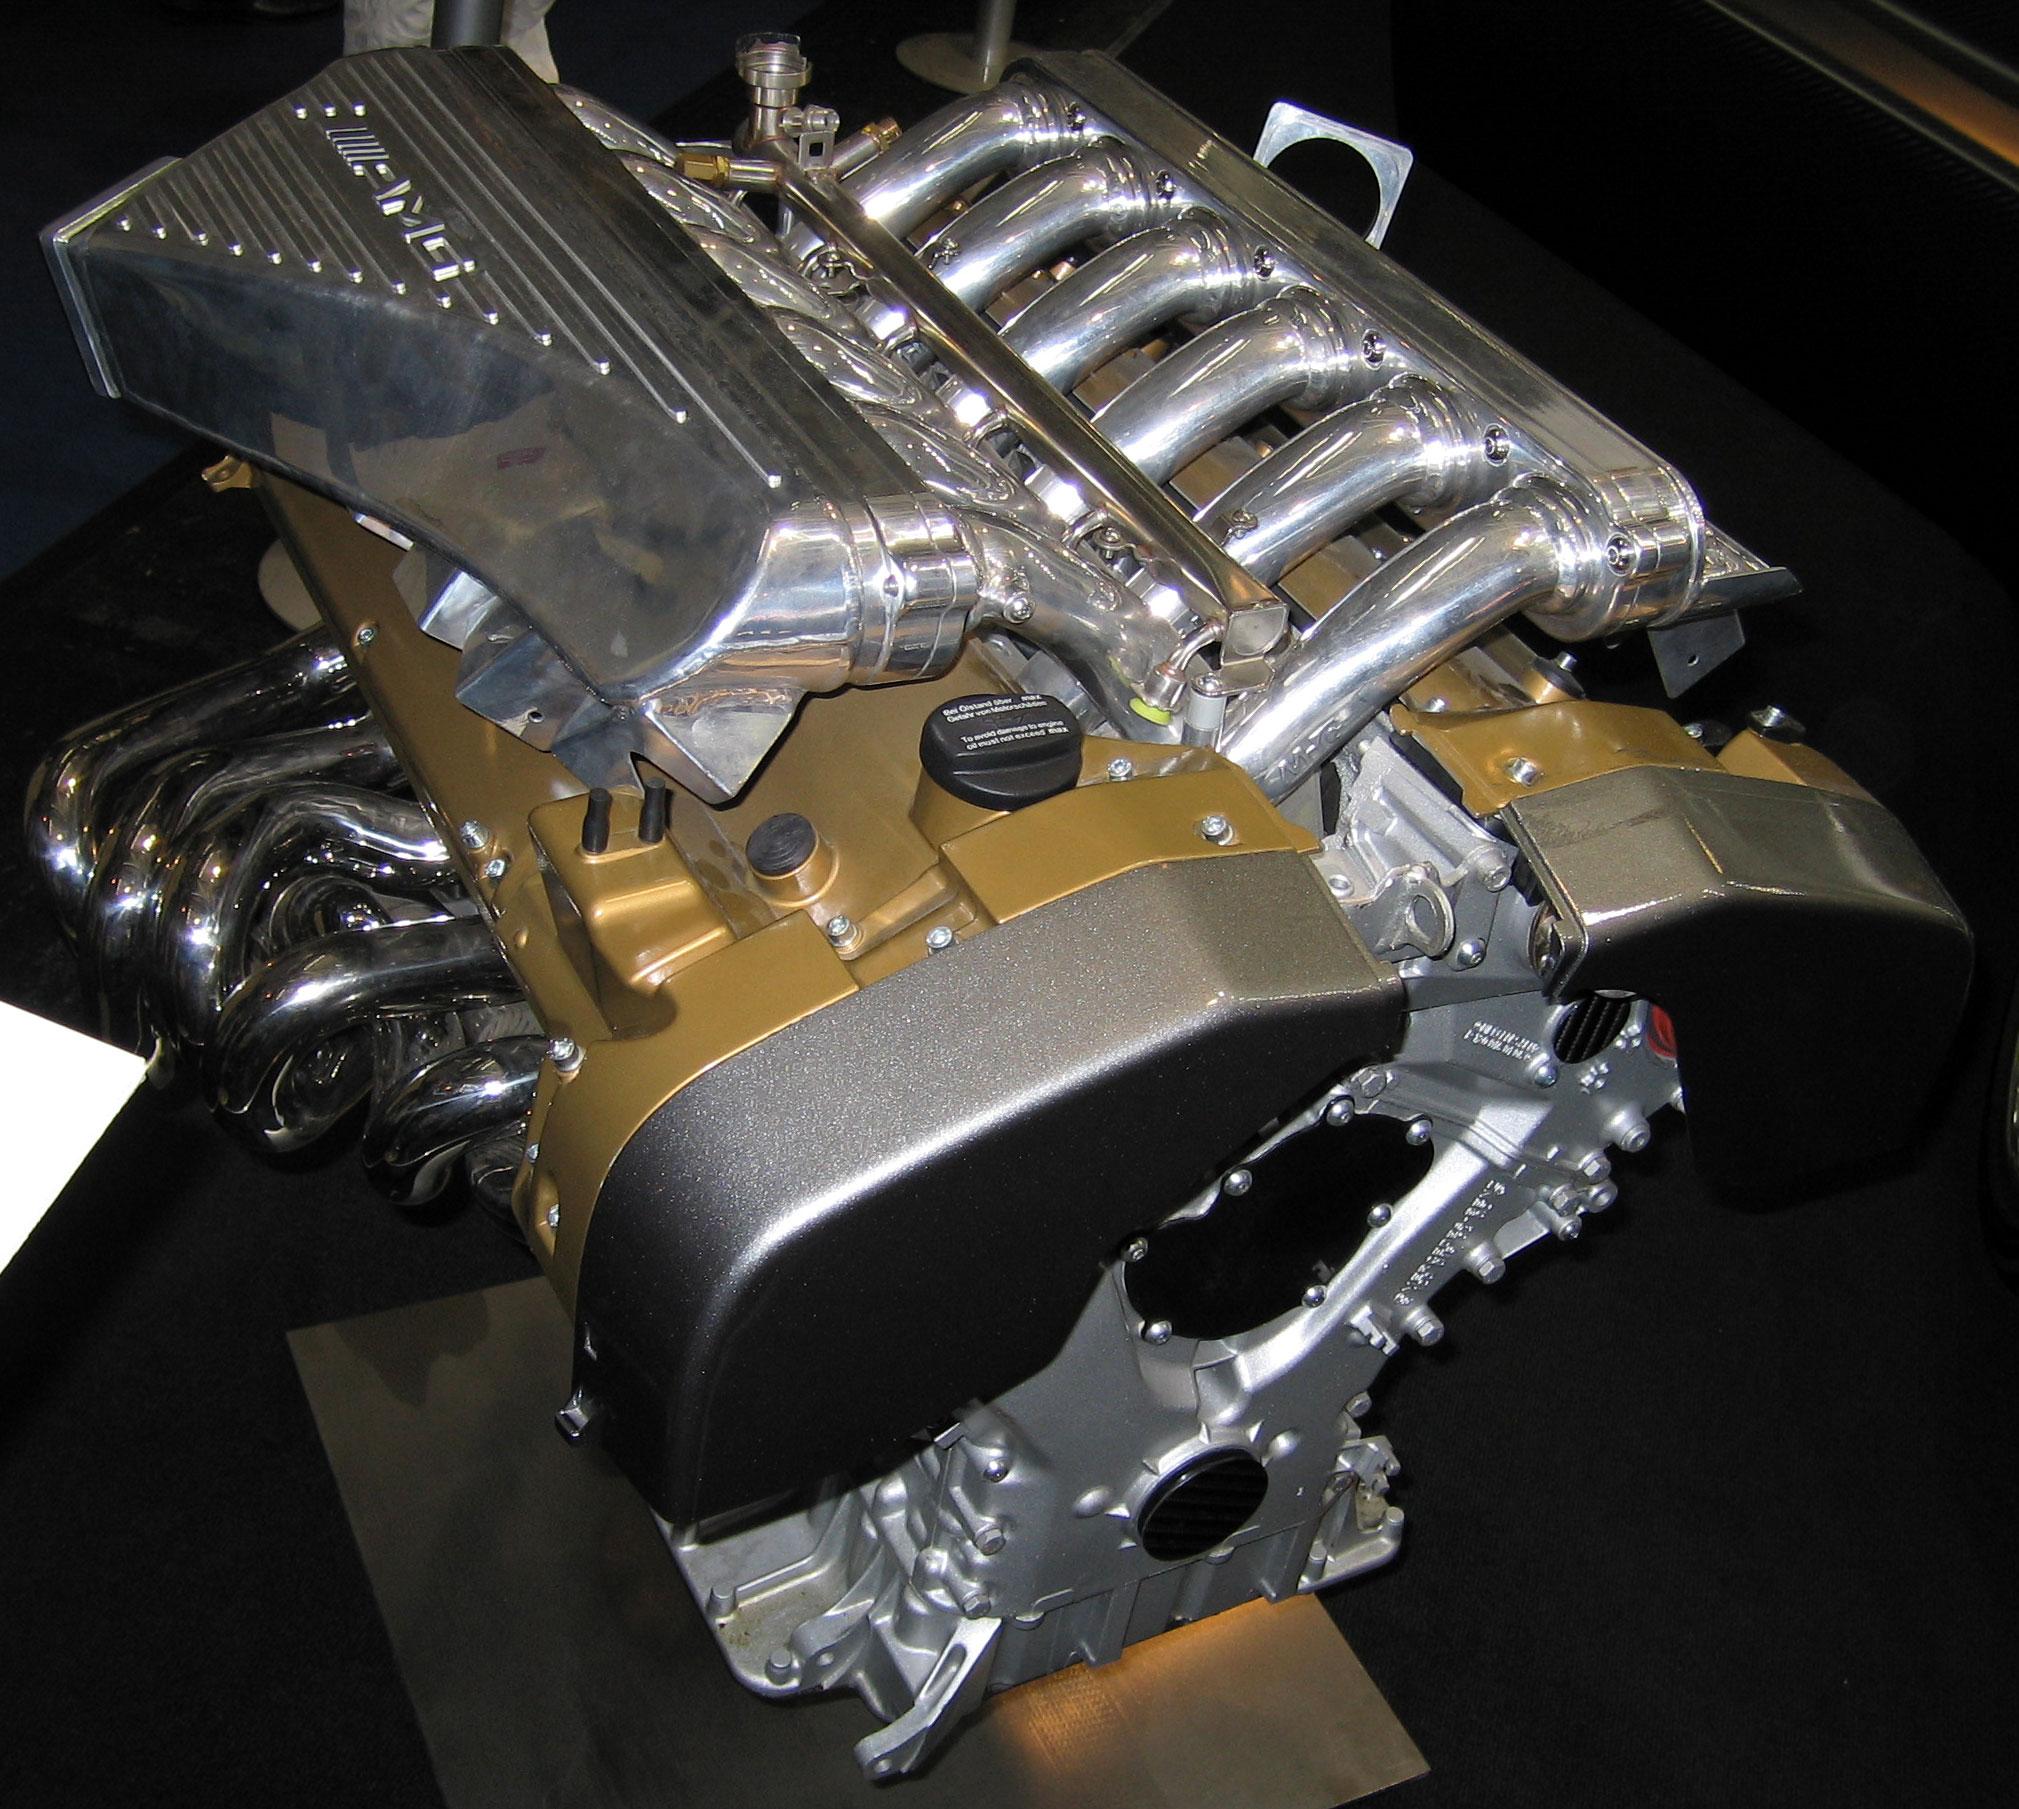 File Pagani Zonda F Engine Amg V12 7 3l 2 Jpg Wikimedia Commons